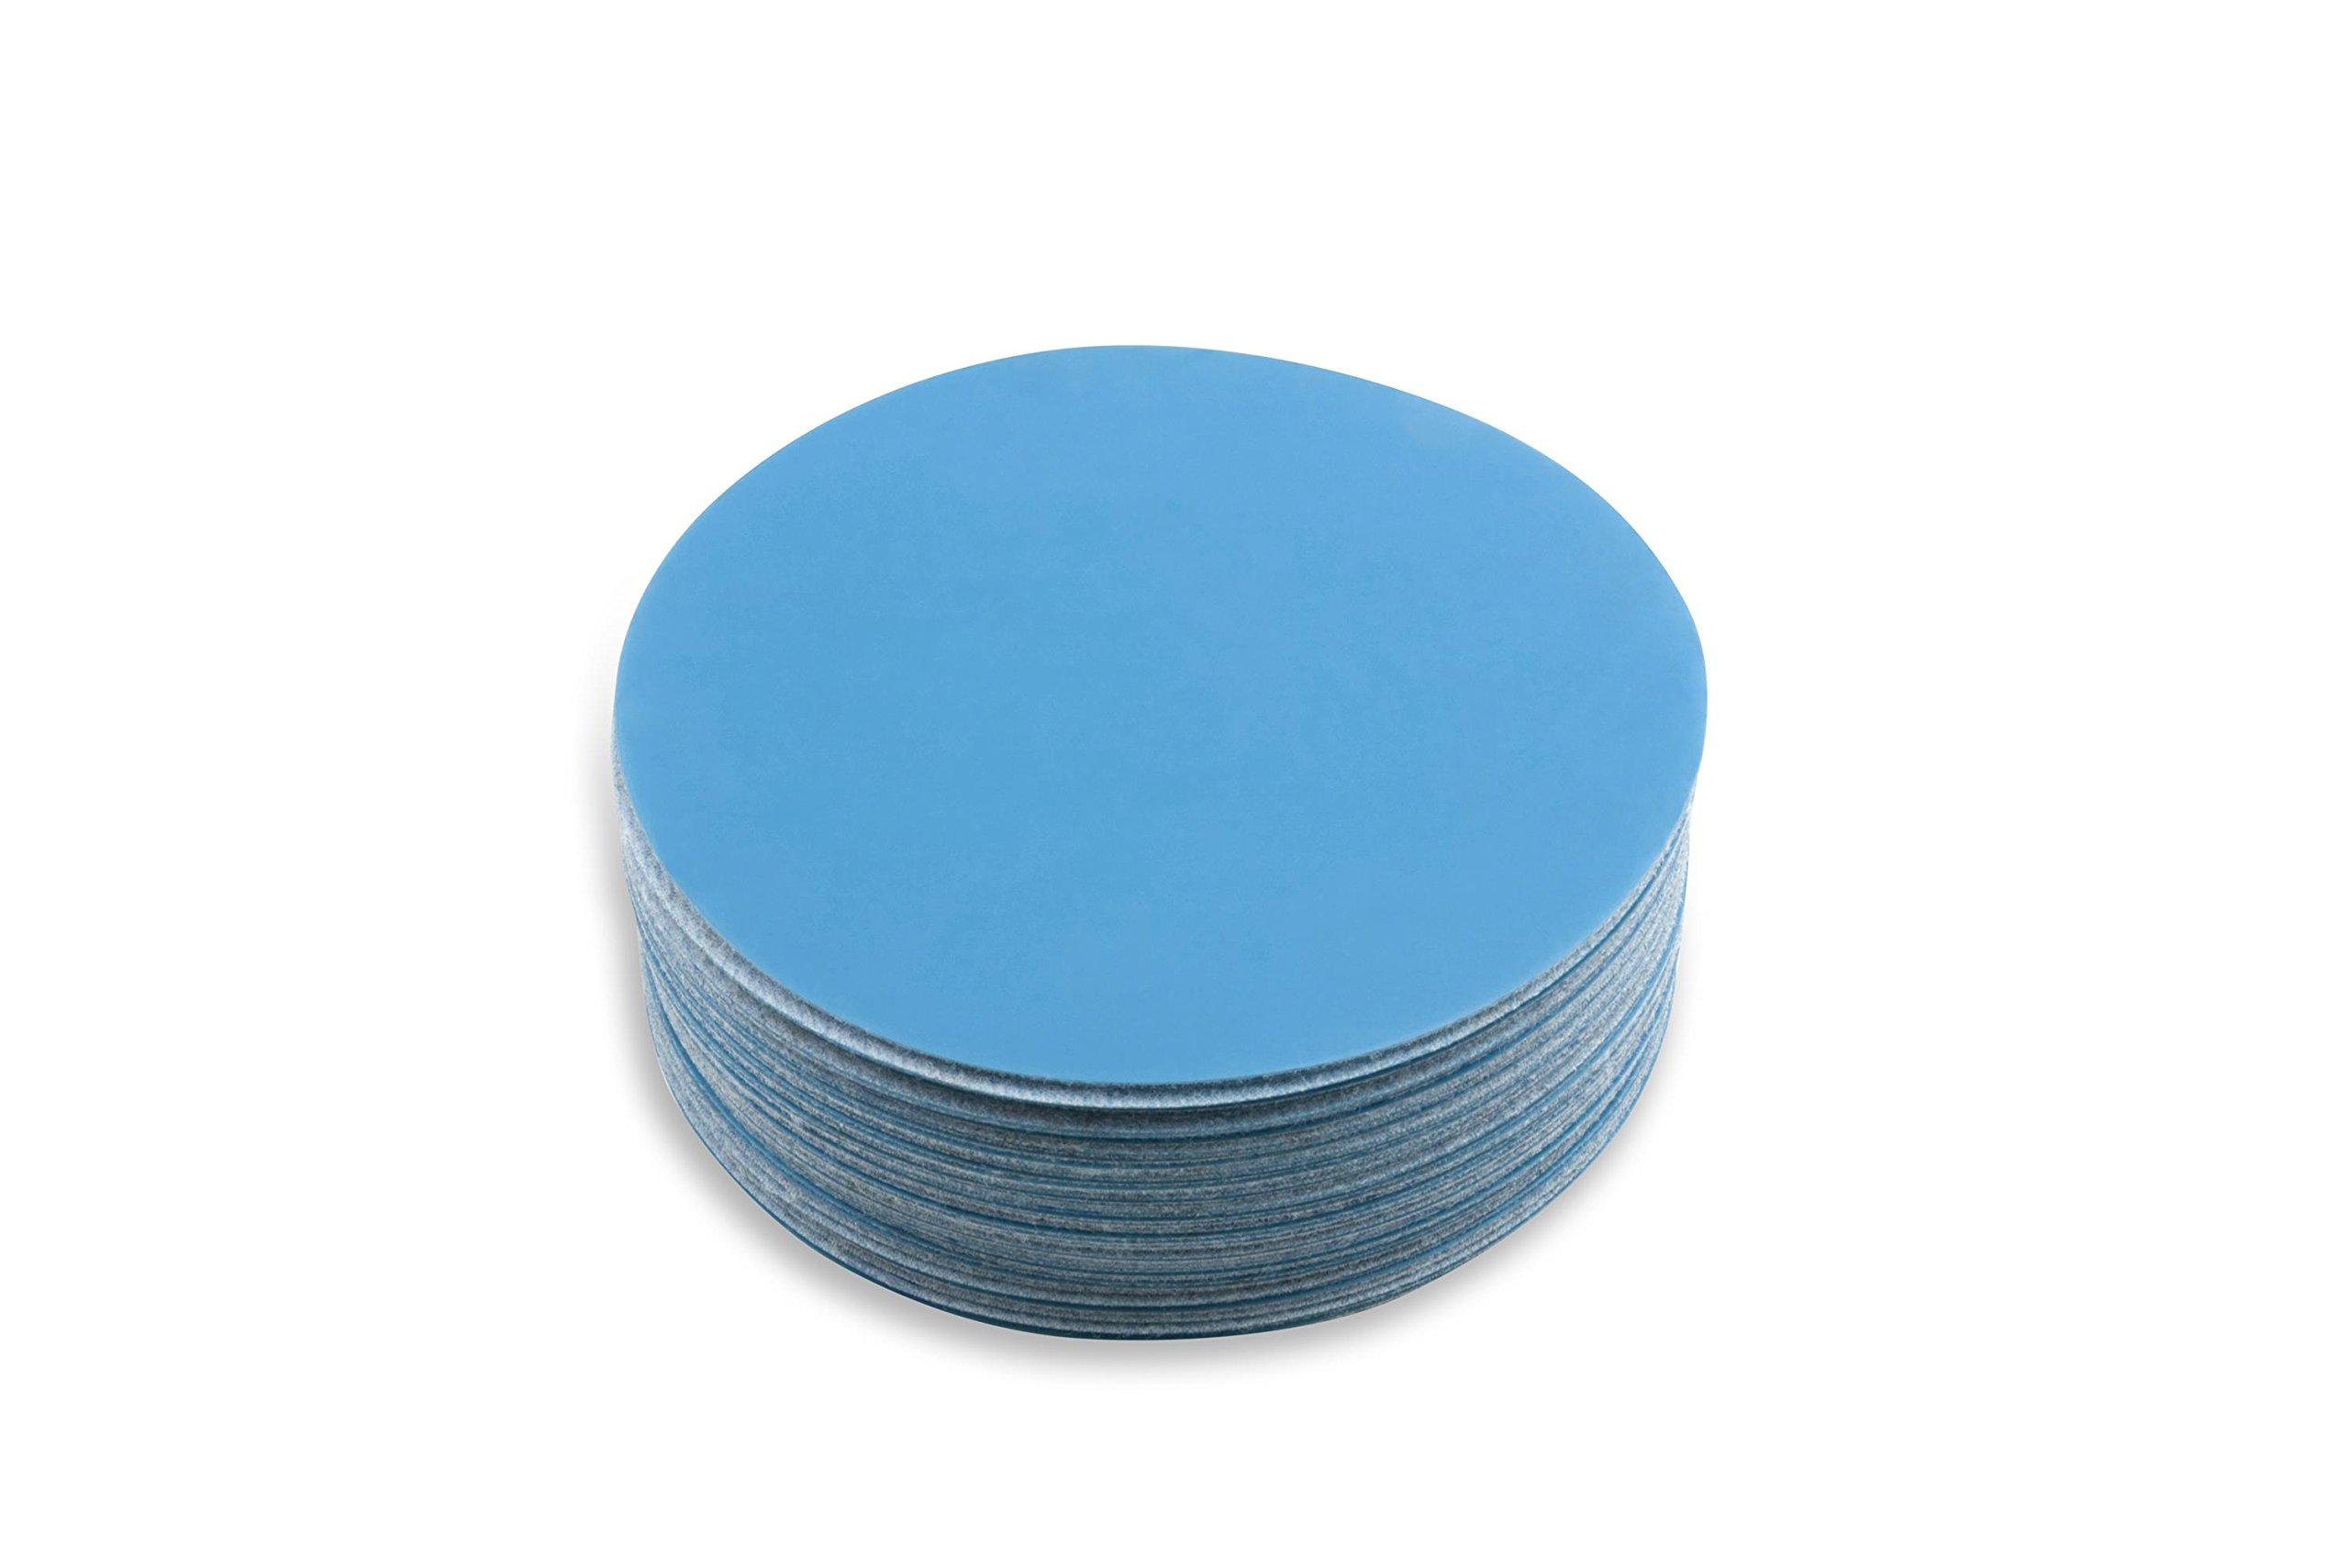 6 Inch 1500 Grit Hook and Loop Metal Sharpening/Polishing Film Sanding Discs, 50 Pack by Red Label Abrasives